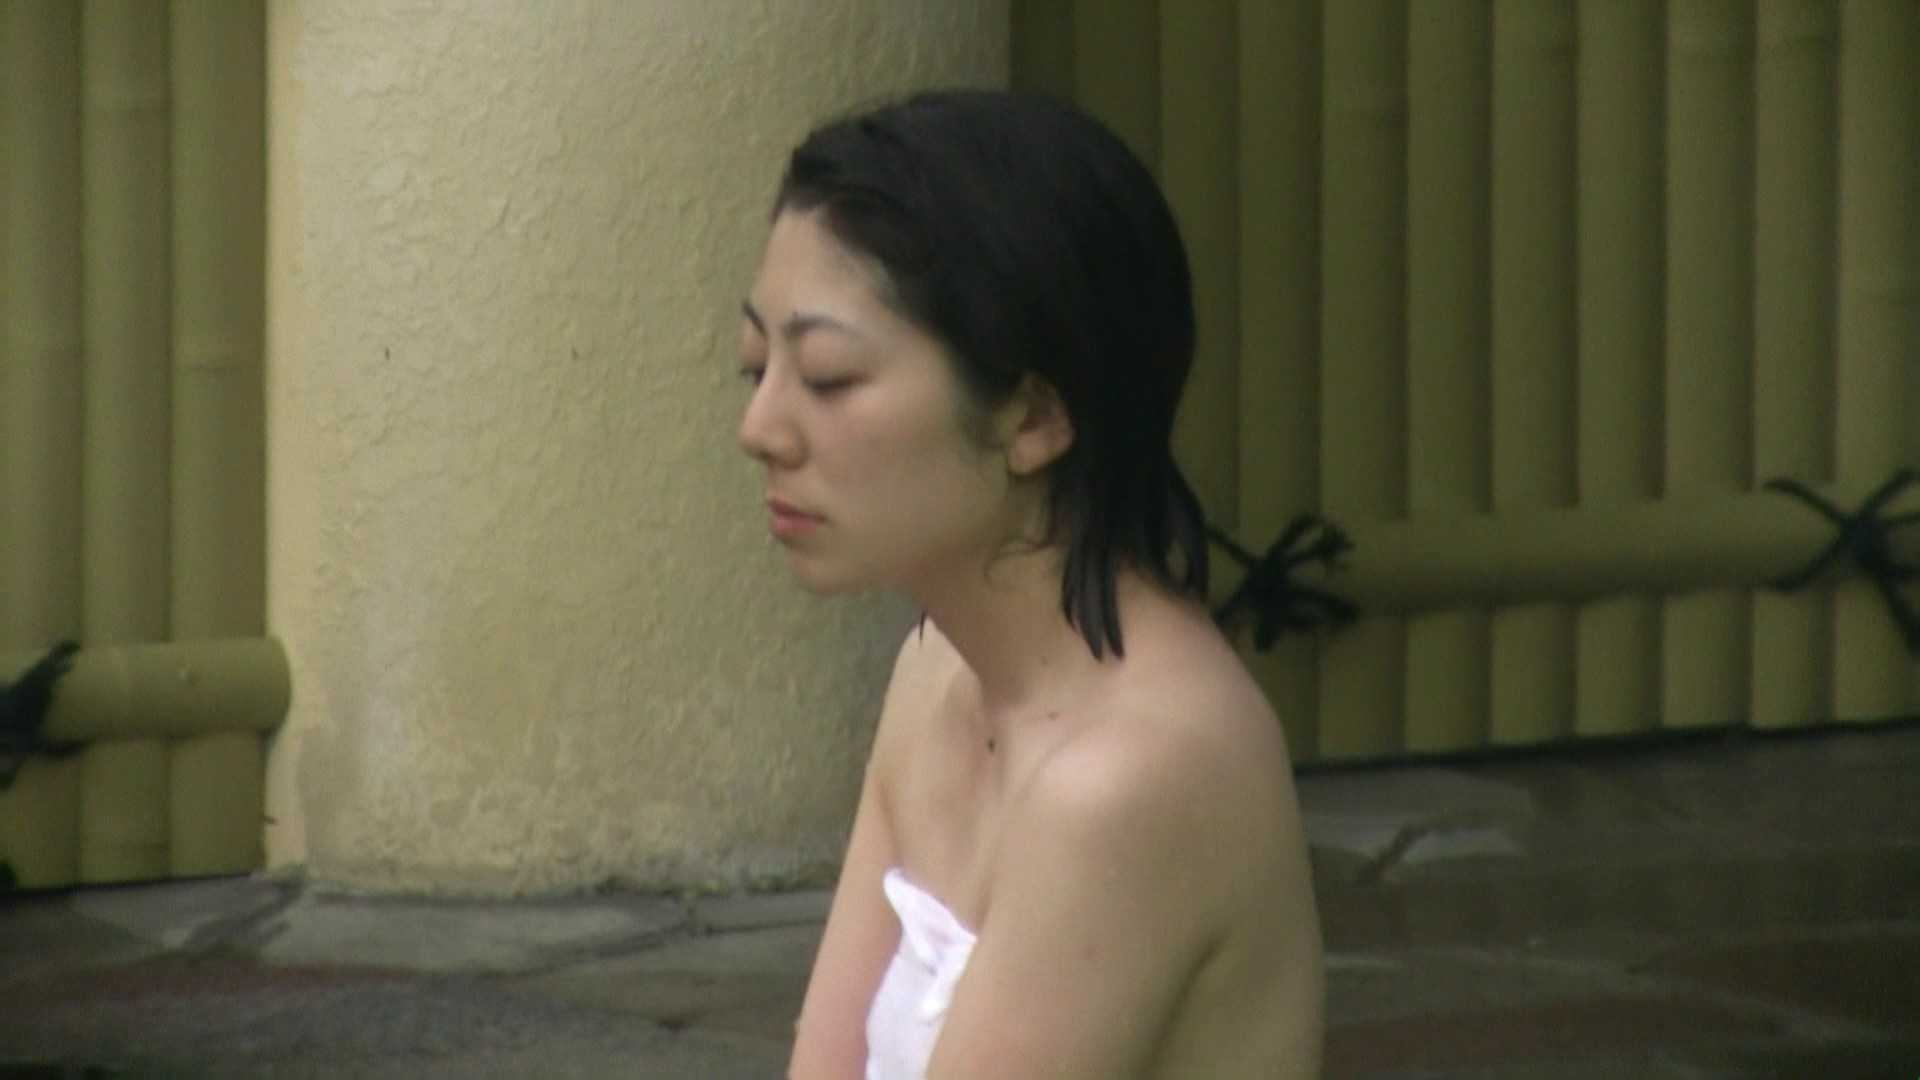 Aquaな露天風呂Vol.04 露天風呂編 | 盗撮シリーズ  94PIX 39